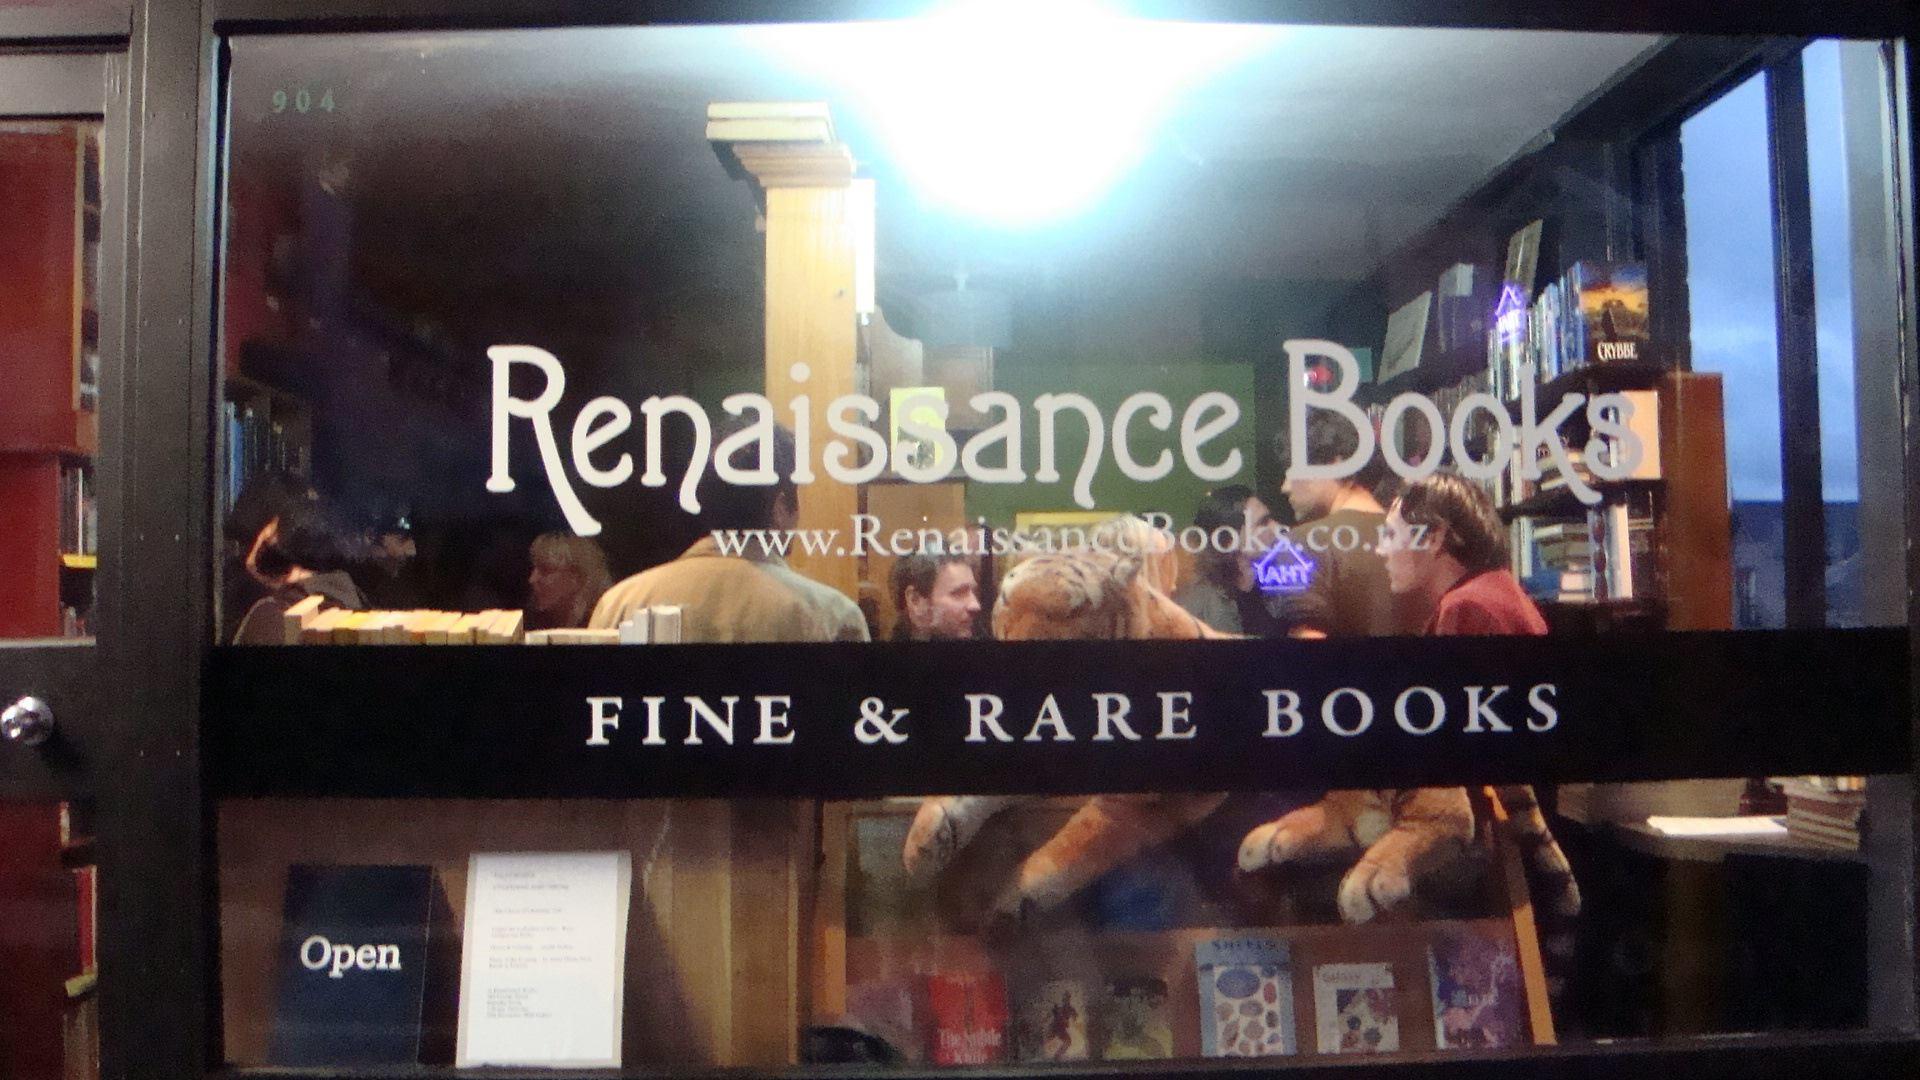 Picture of Renaissance Books' storefront